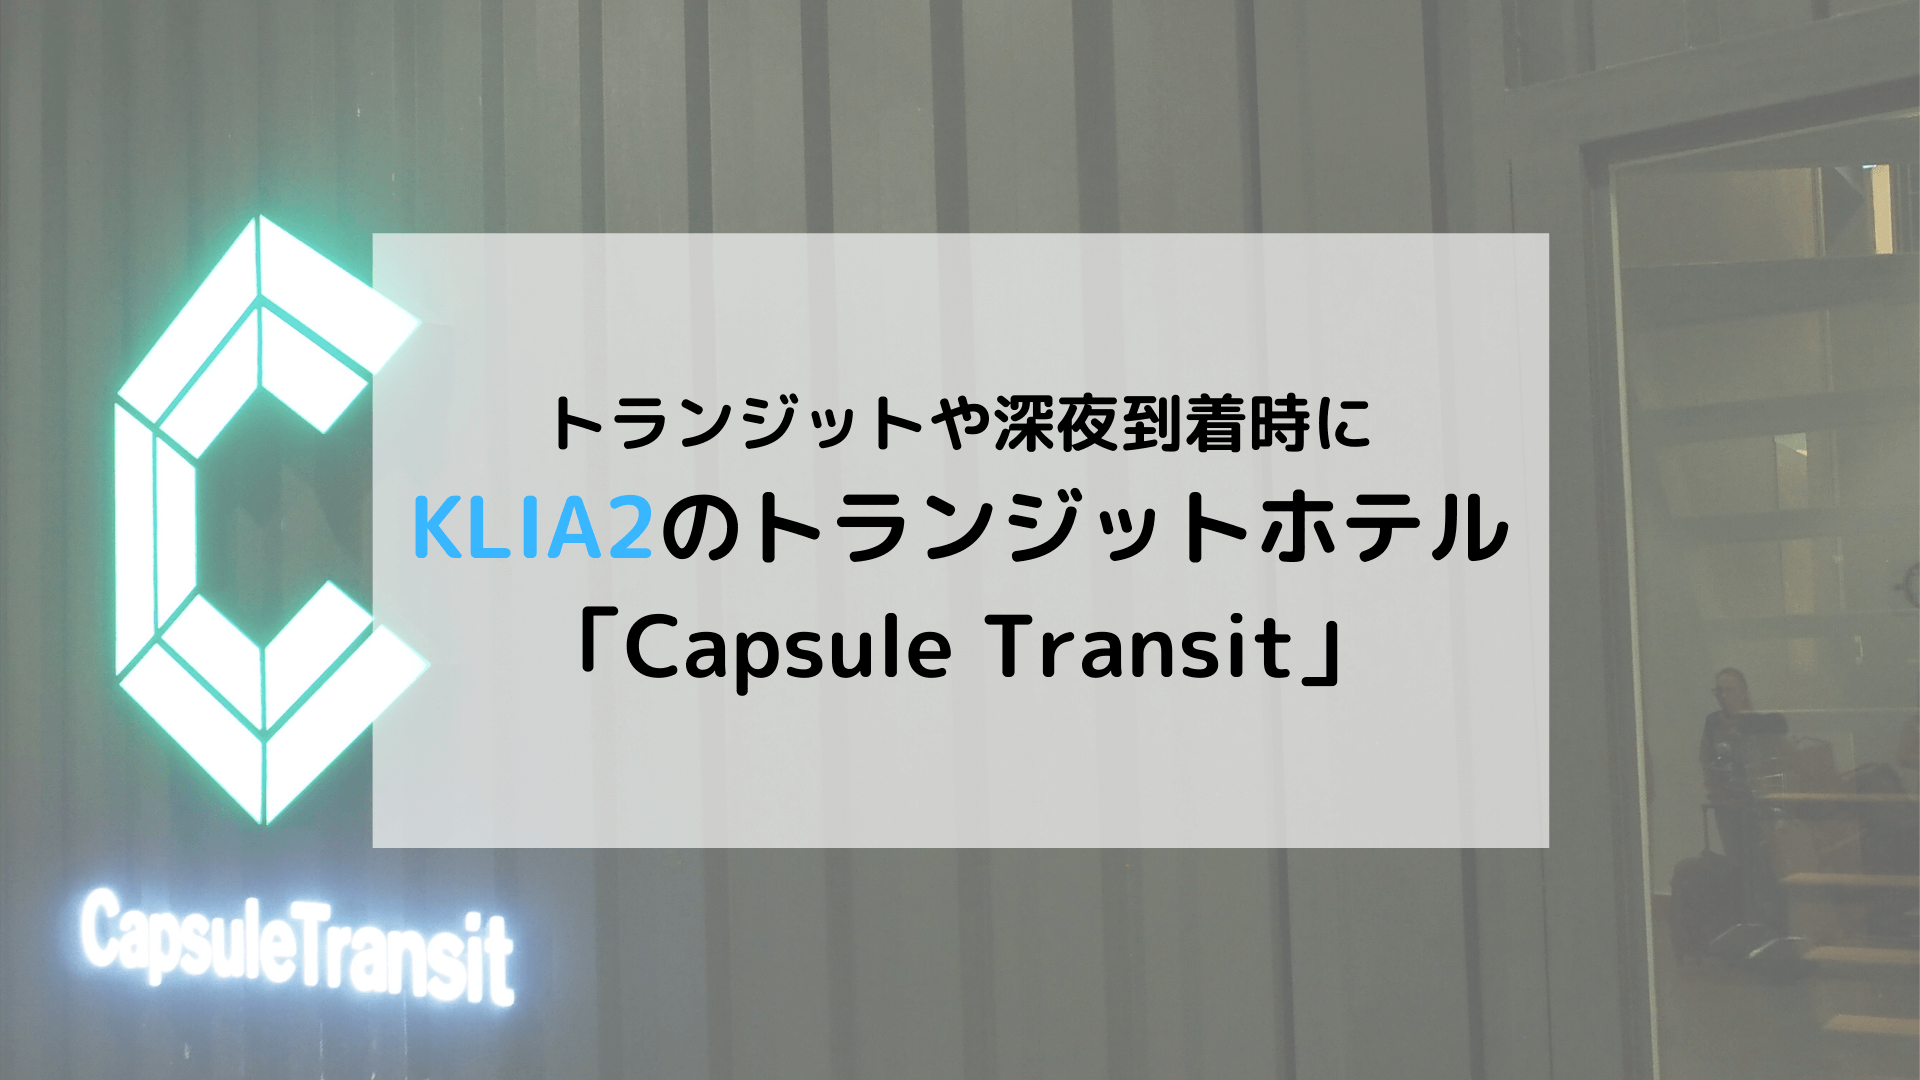 KLIA2内のトランジットホテル紹介